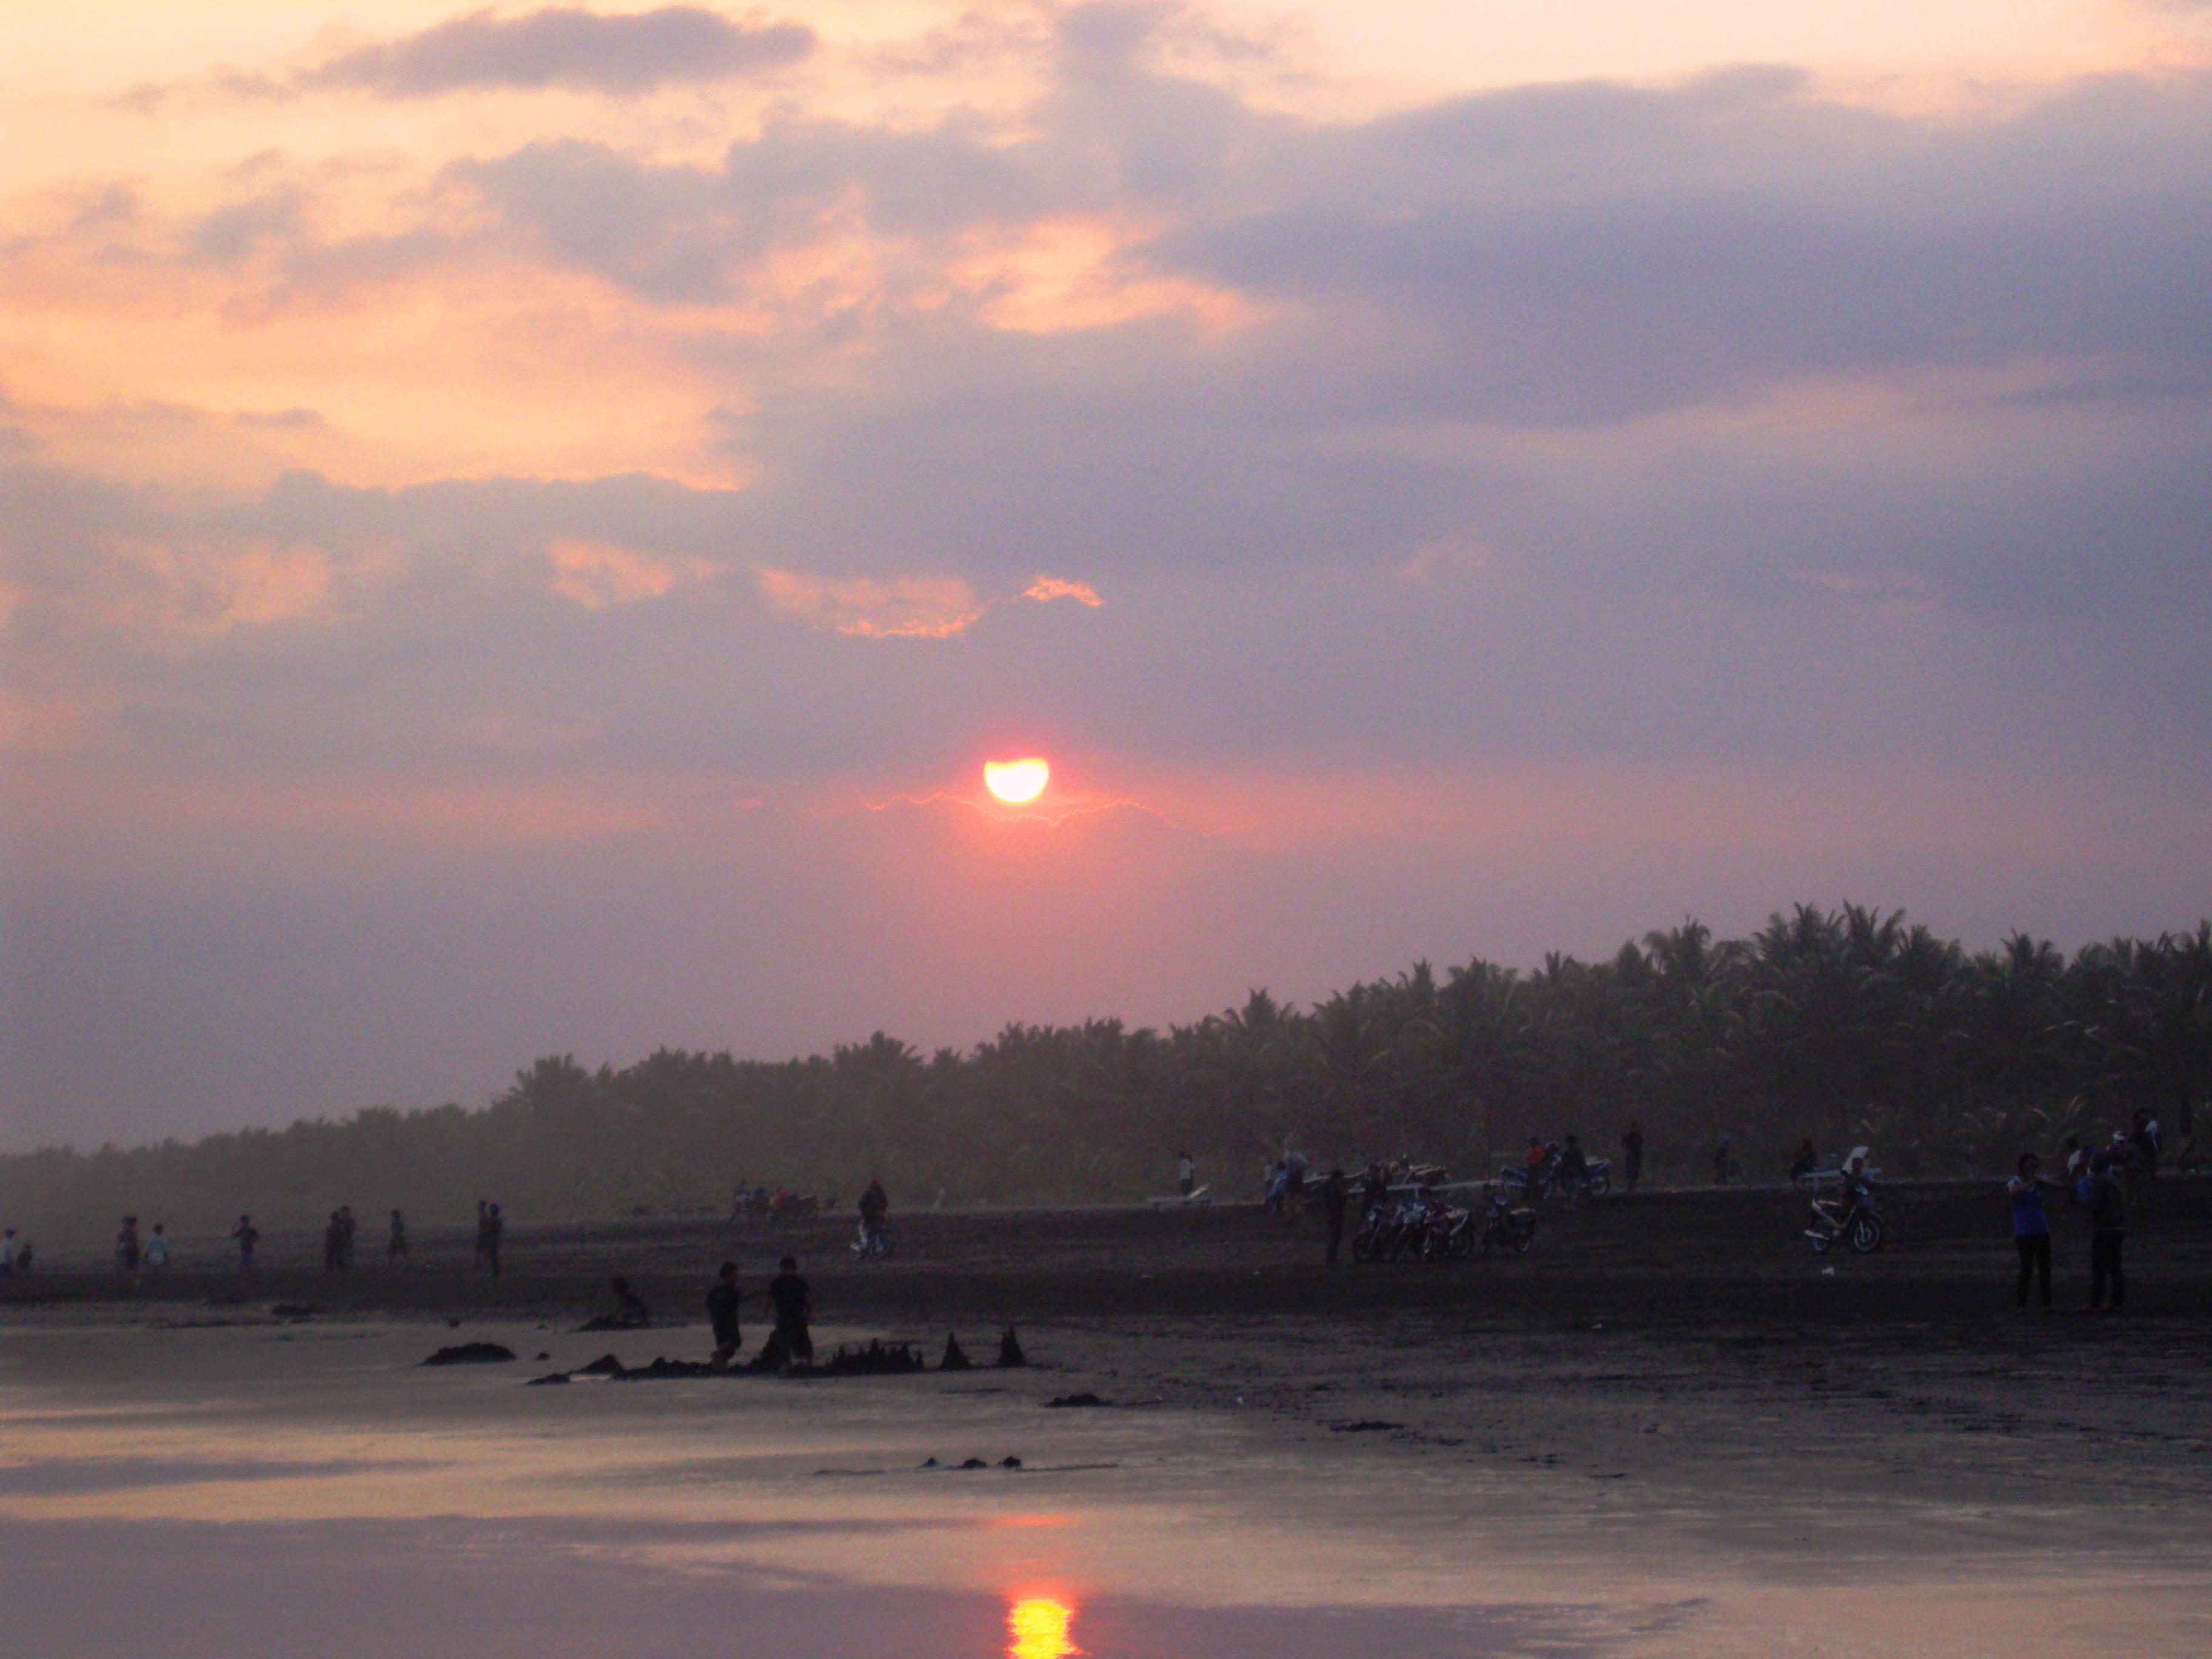 Pantai Widarapayung Menawan Cilacap Jawa Tengah Widara Payung Kab